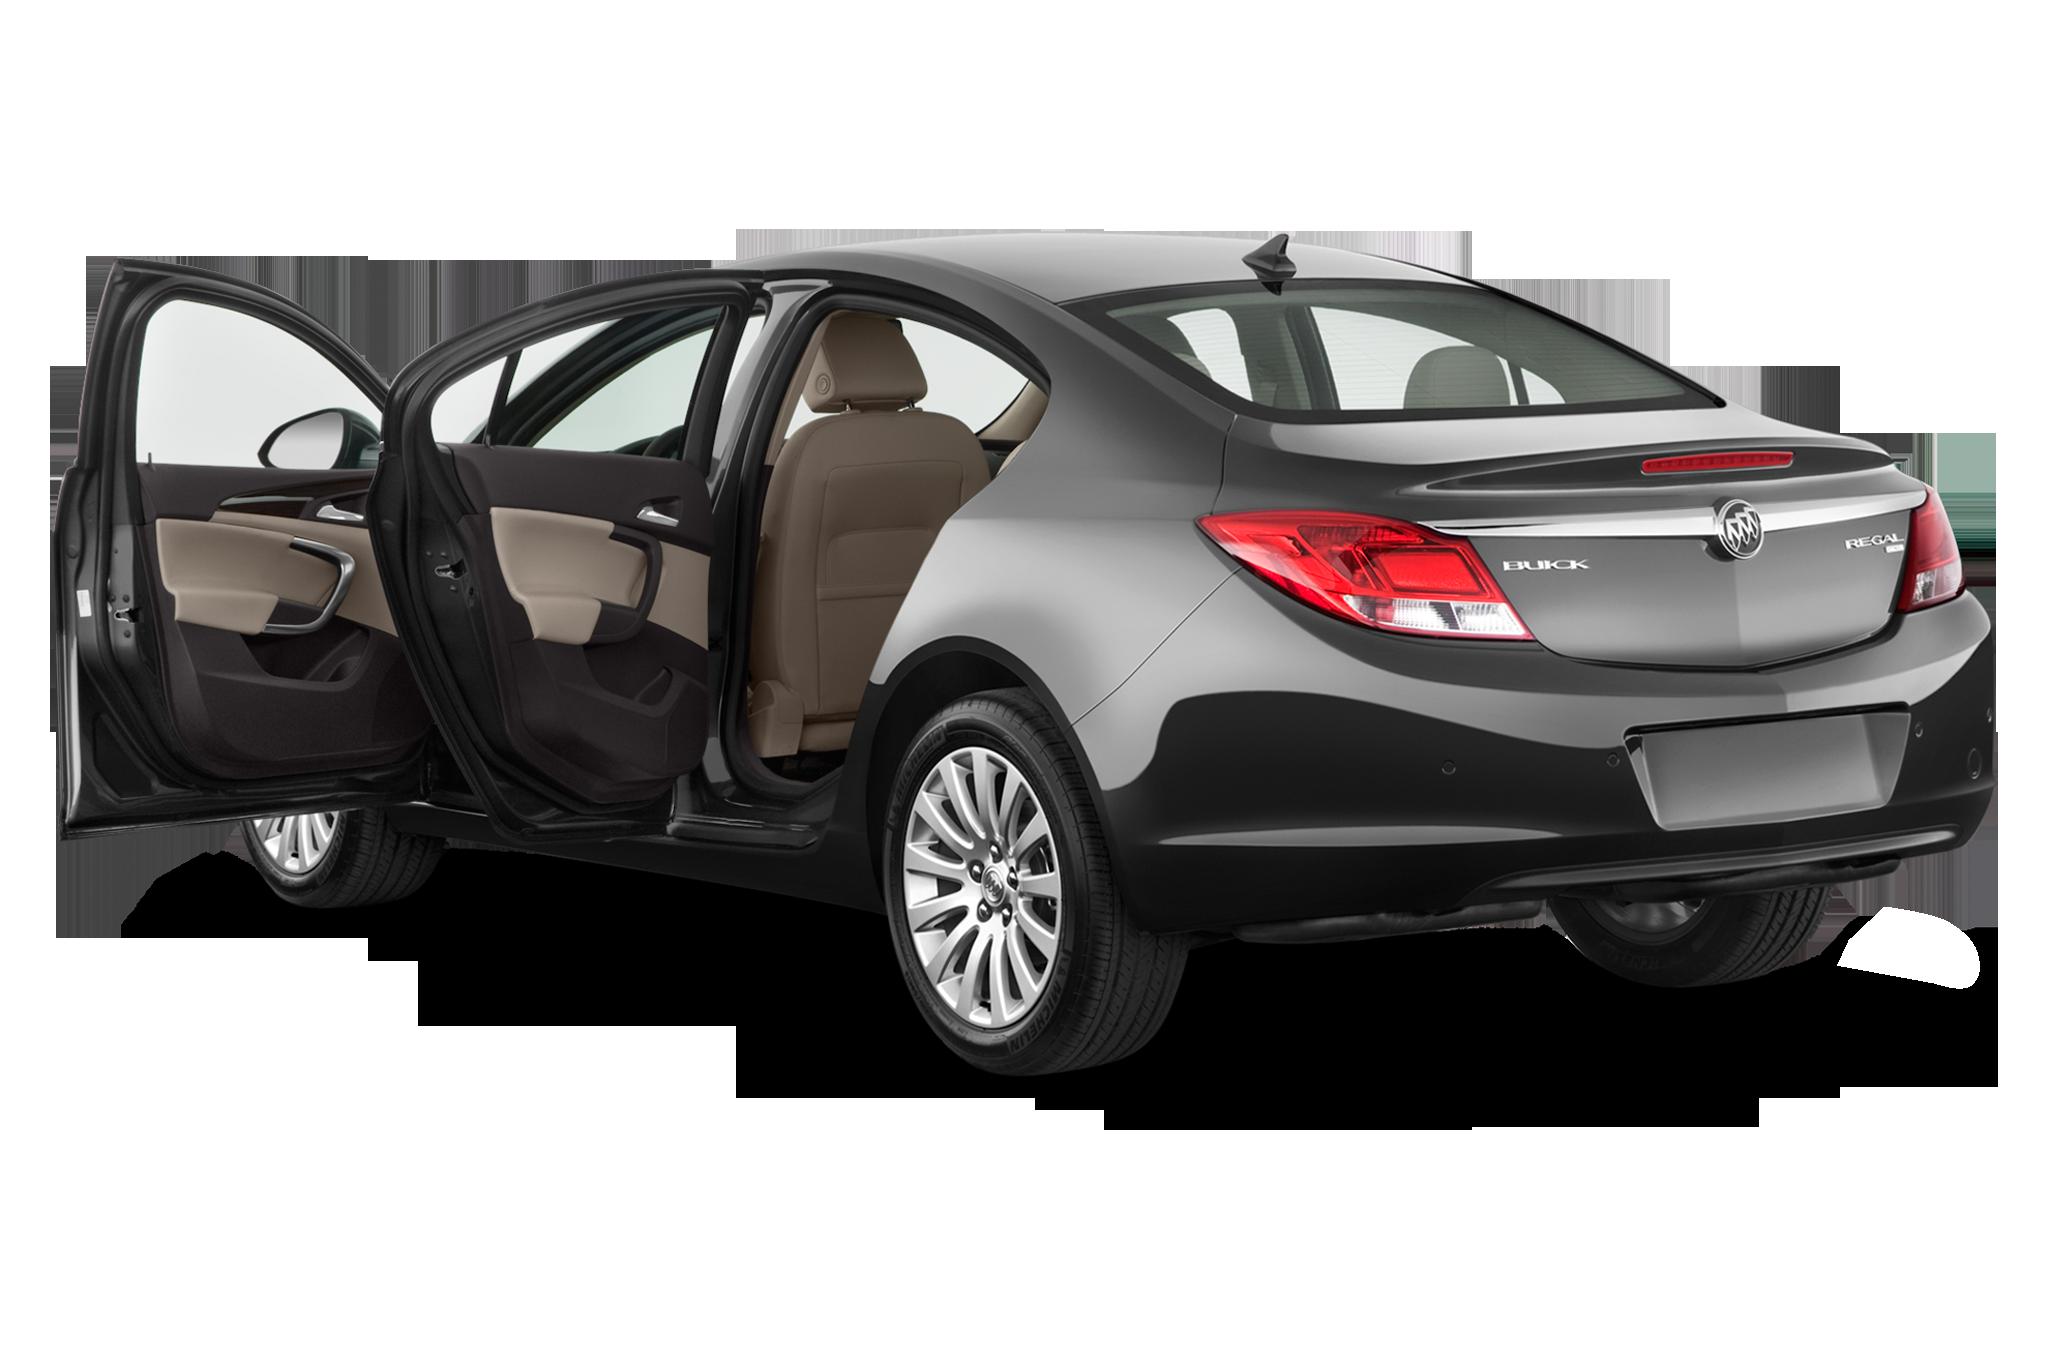 driven 2012 buick regal gs automatic automobile magazine. Black Bedroom Furniture Sets. Home Design Ideas